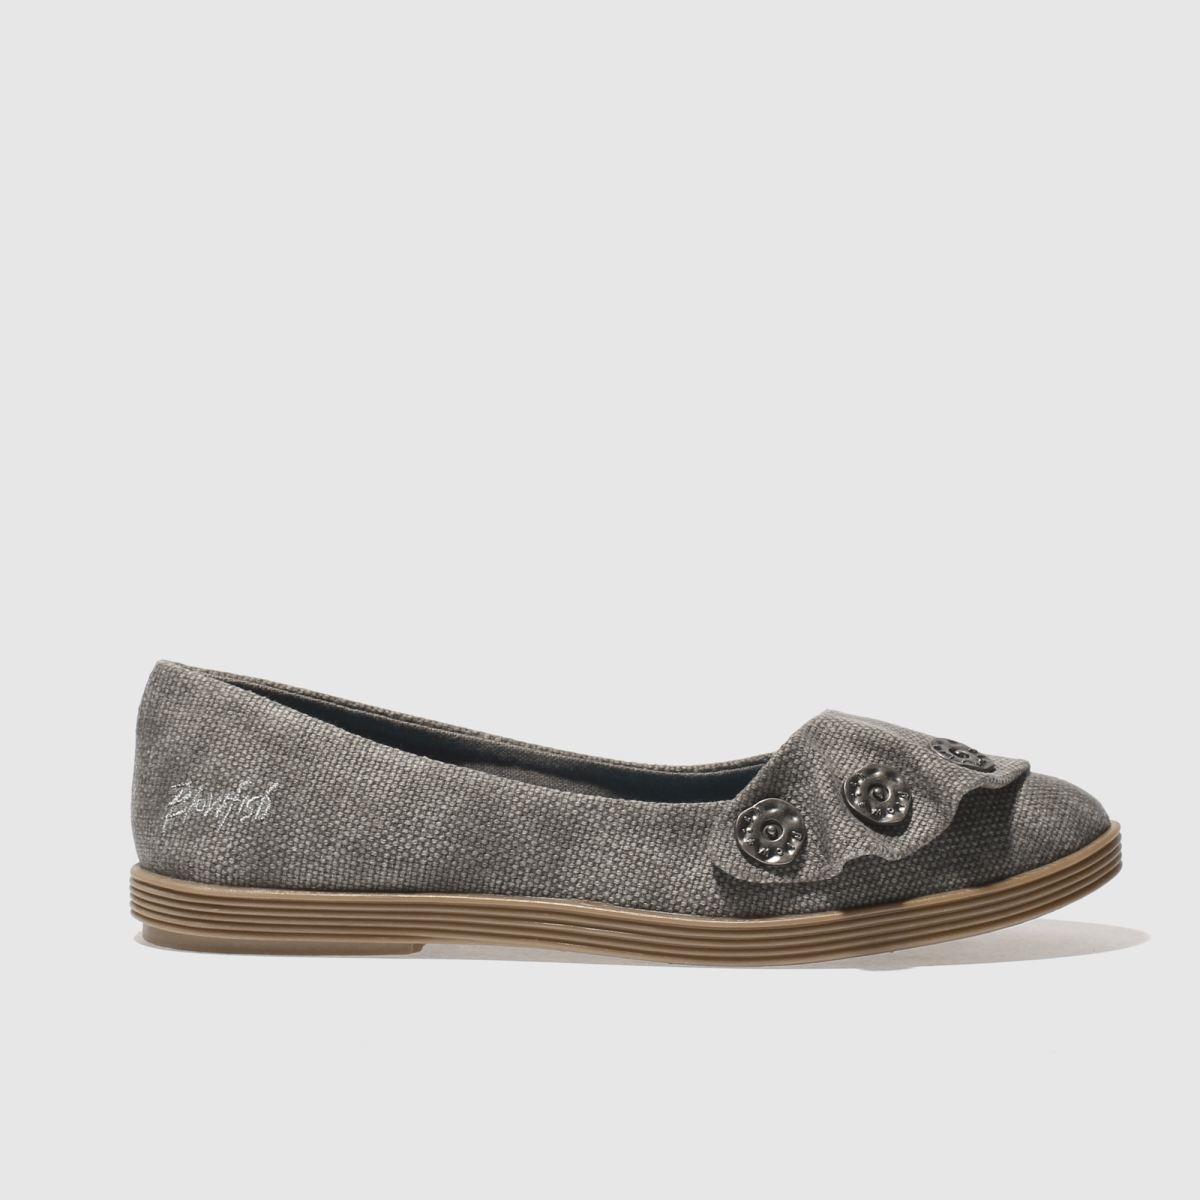 blowfish dark grey garden flat shoes